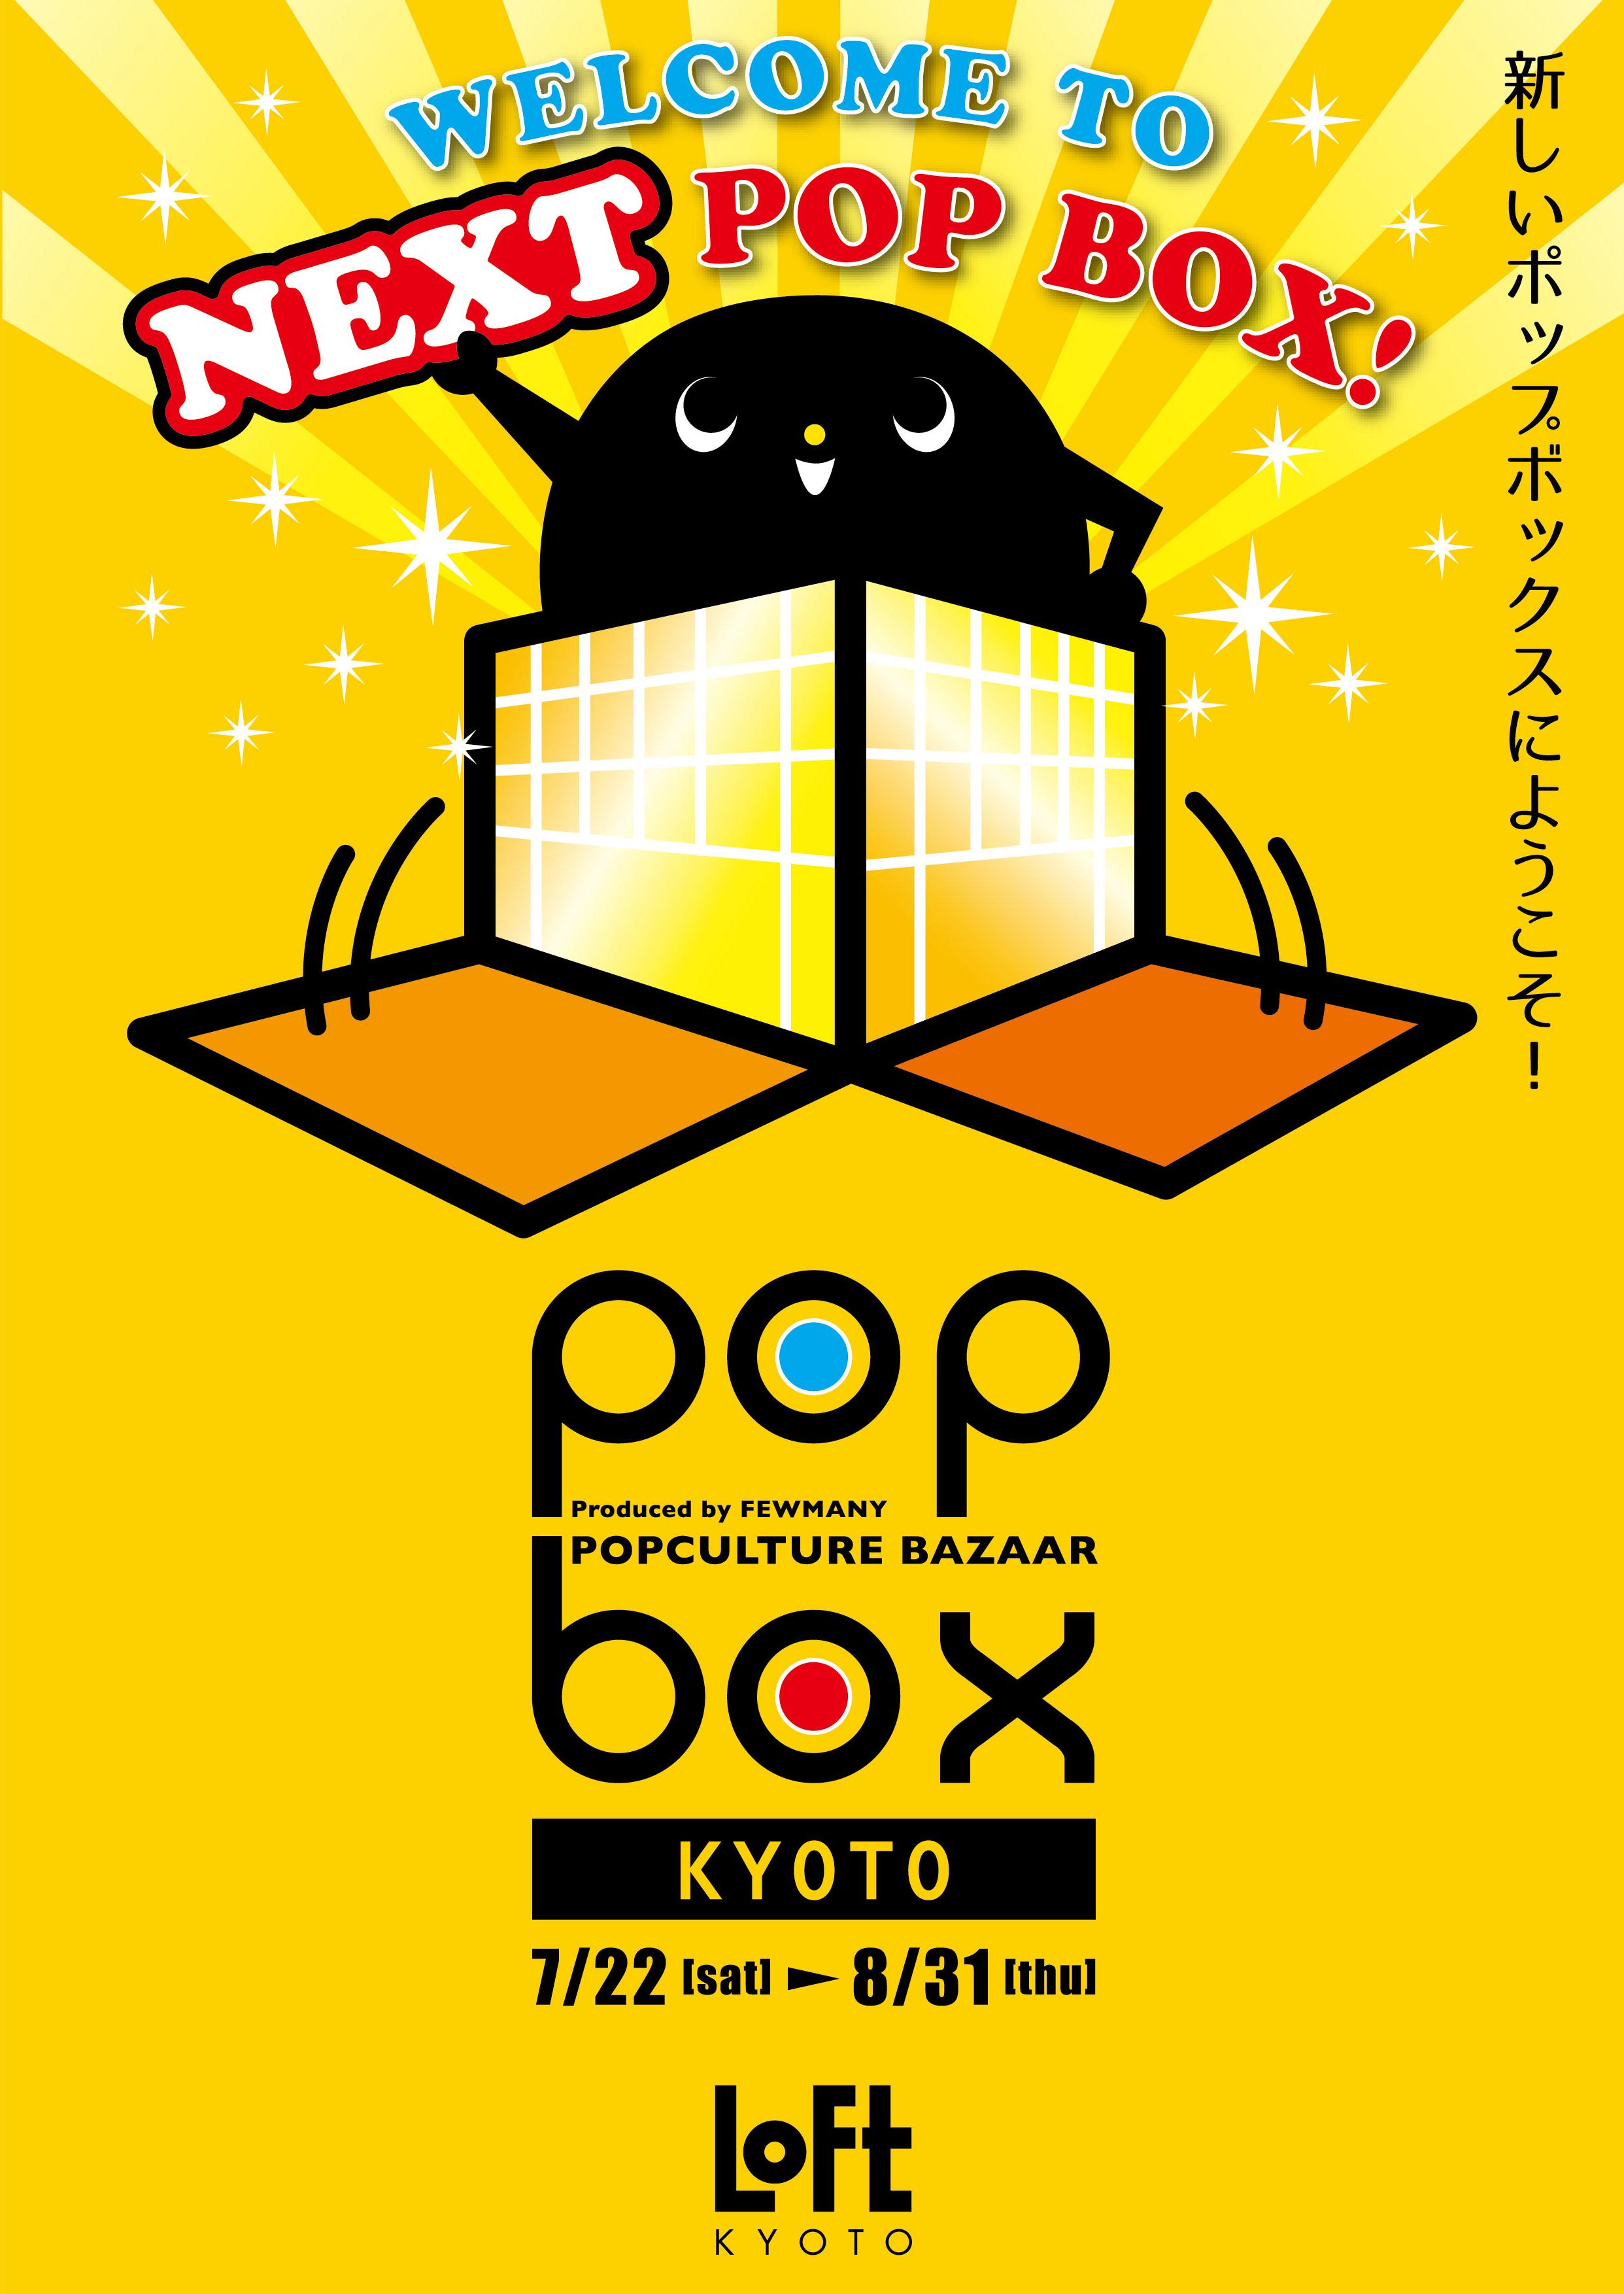 A4flyer_POPBOX_kyoto